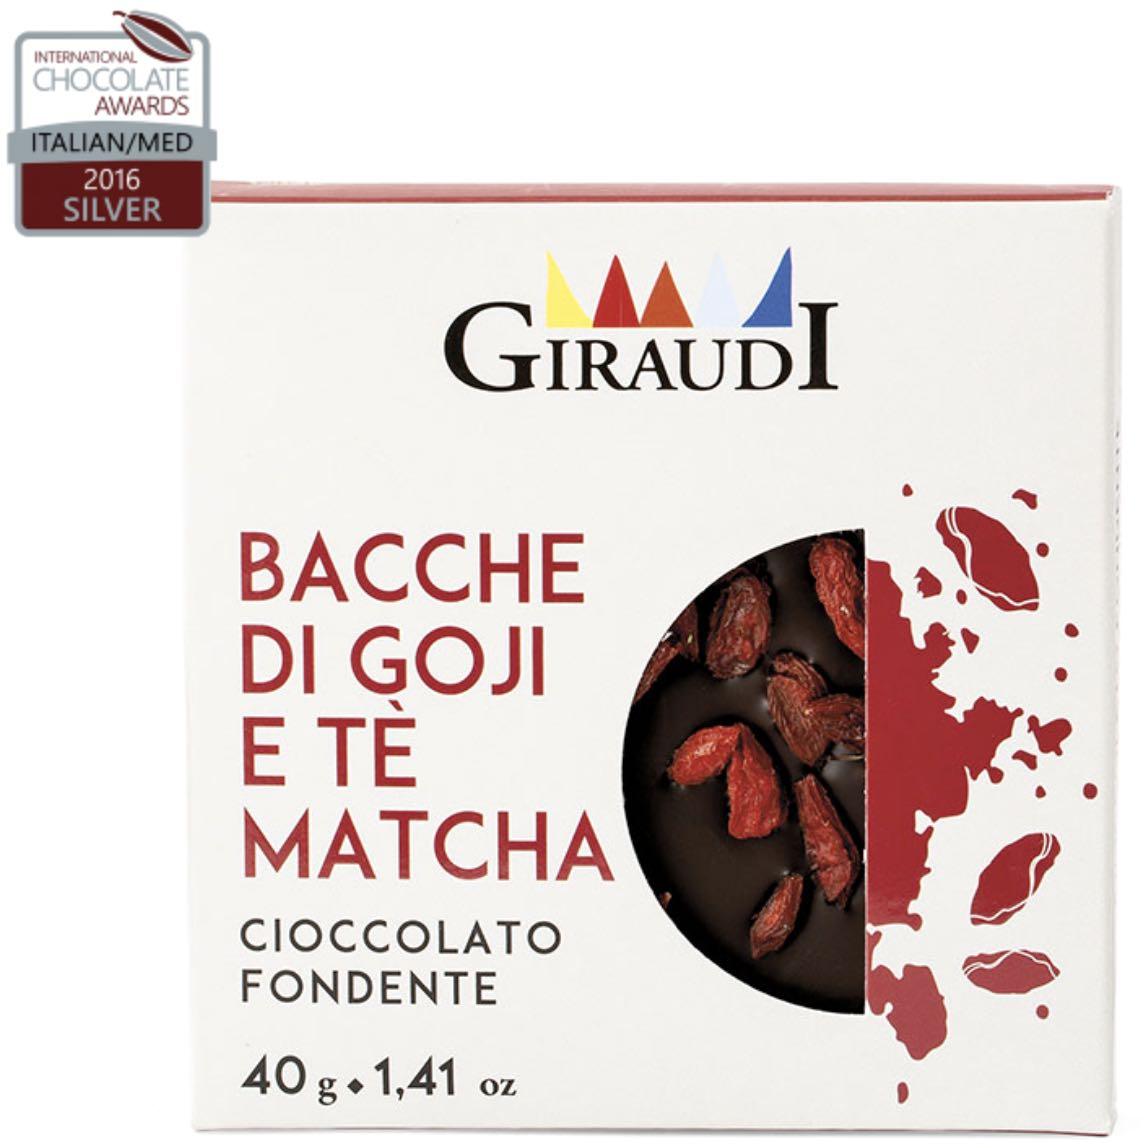 Giraudi cioccolato tavoletta bacche goji e tè matcha – Gustorotondo – buono sano artigiano – spesa online